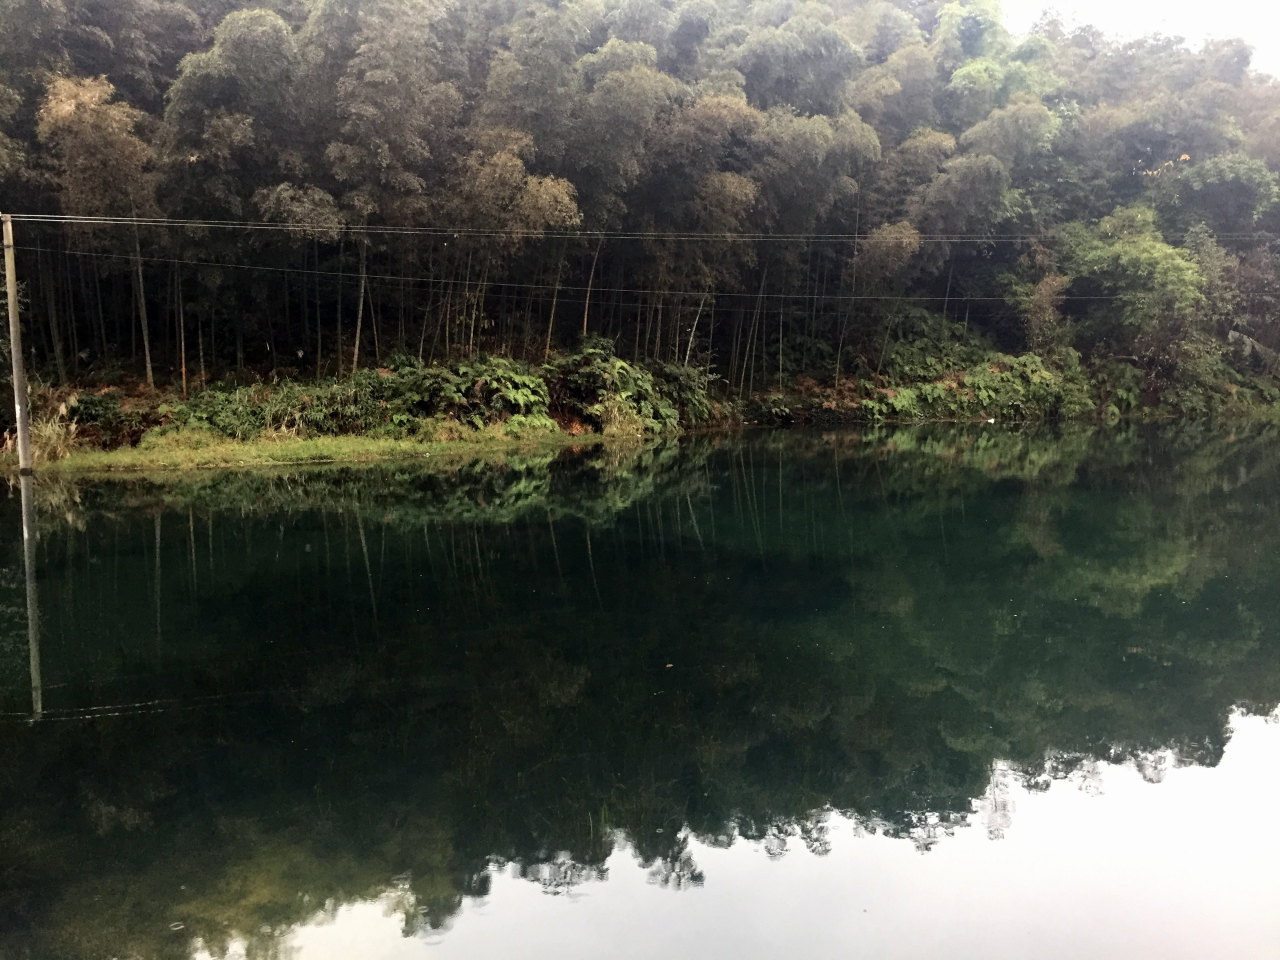 ShuNan Bamboo Sea 蜀南竹海, Bamboo Life